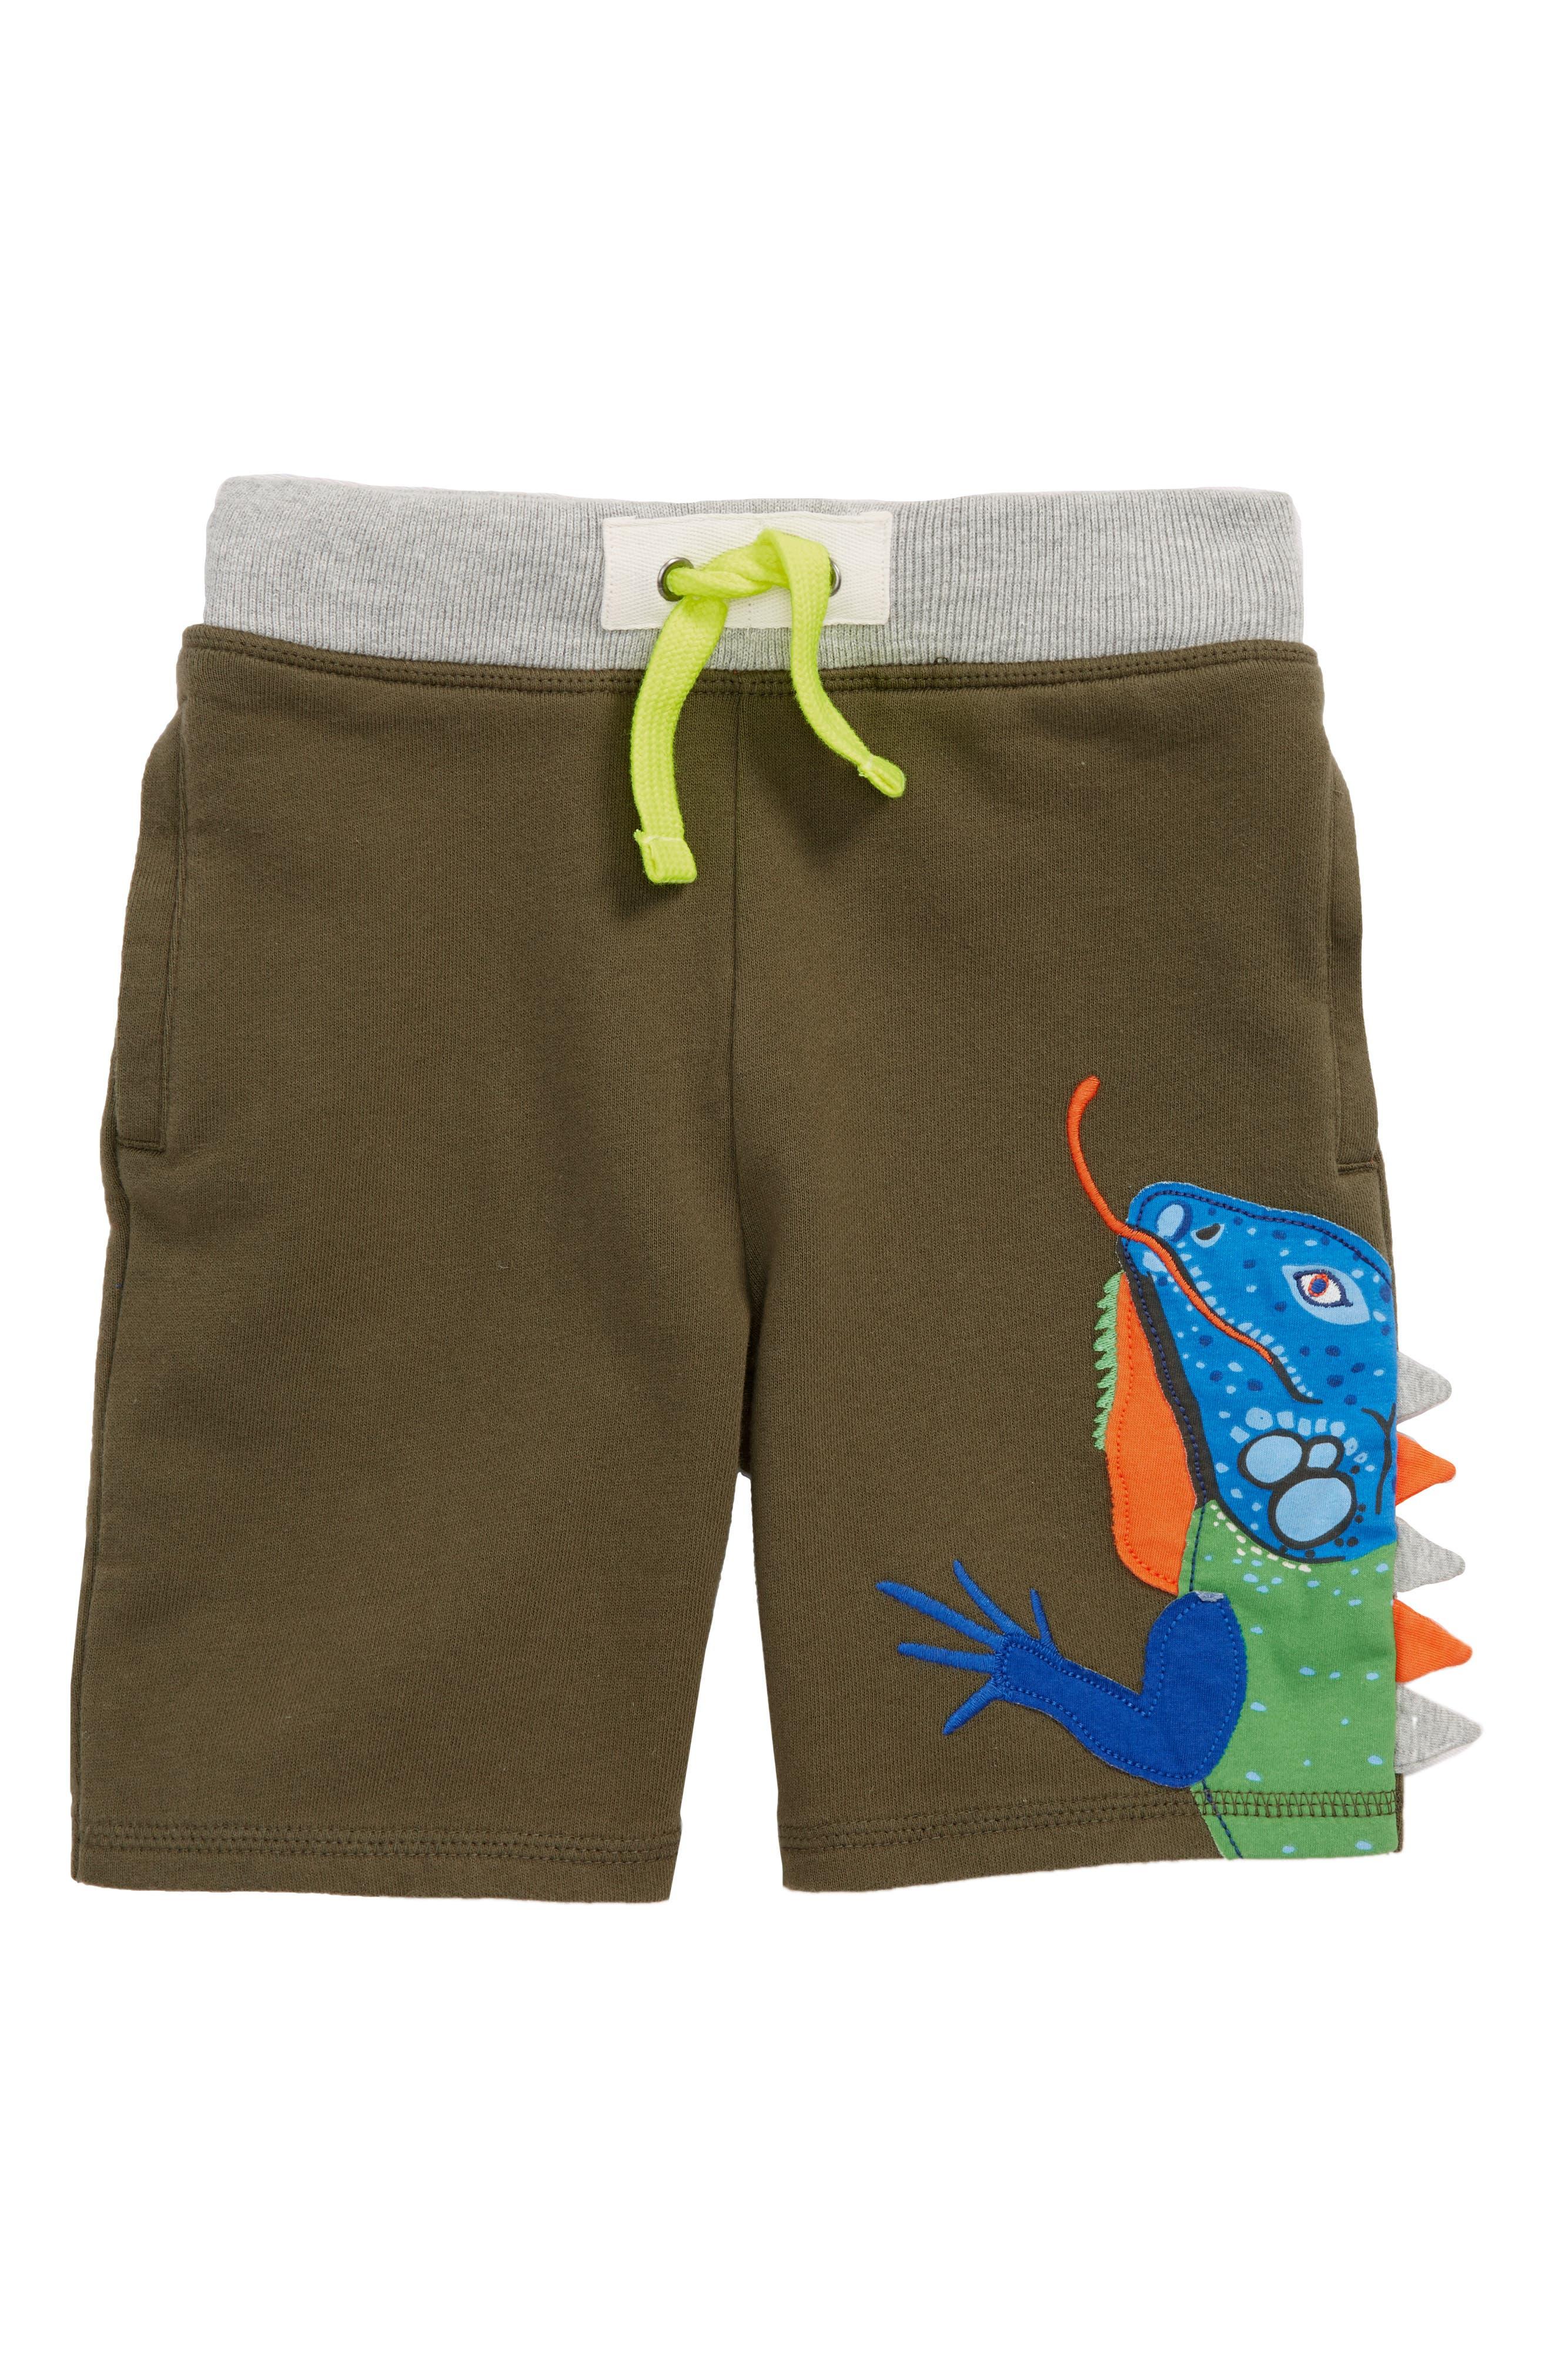 Alternate Image 1 Selected - Mini Boden Iguana Appliqué Sweatshorts (Toddler Boys, Little Boys & Big Boys)